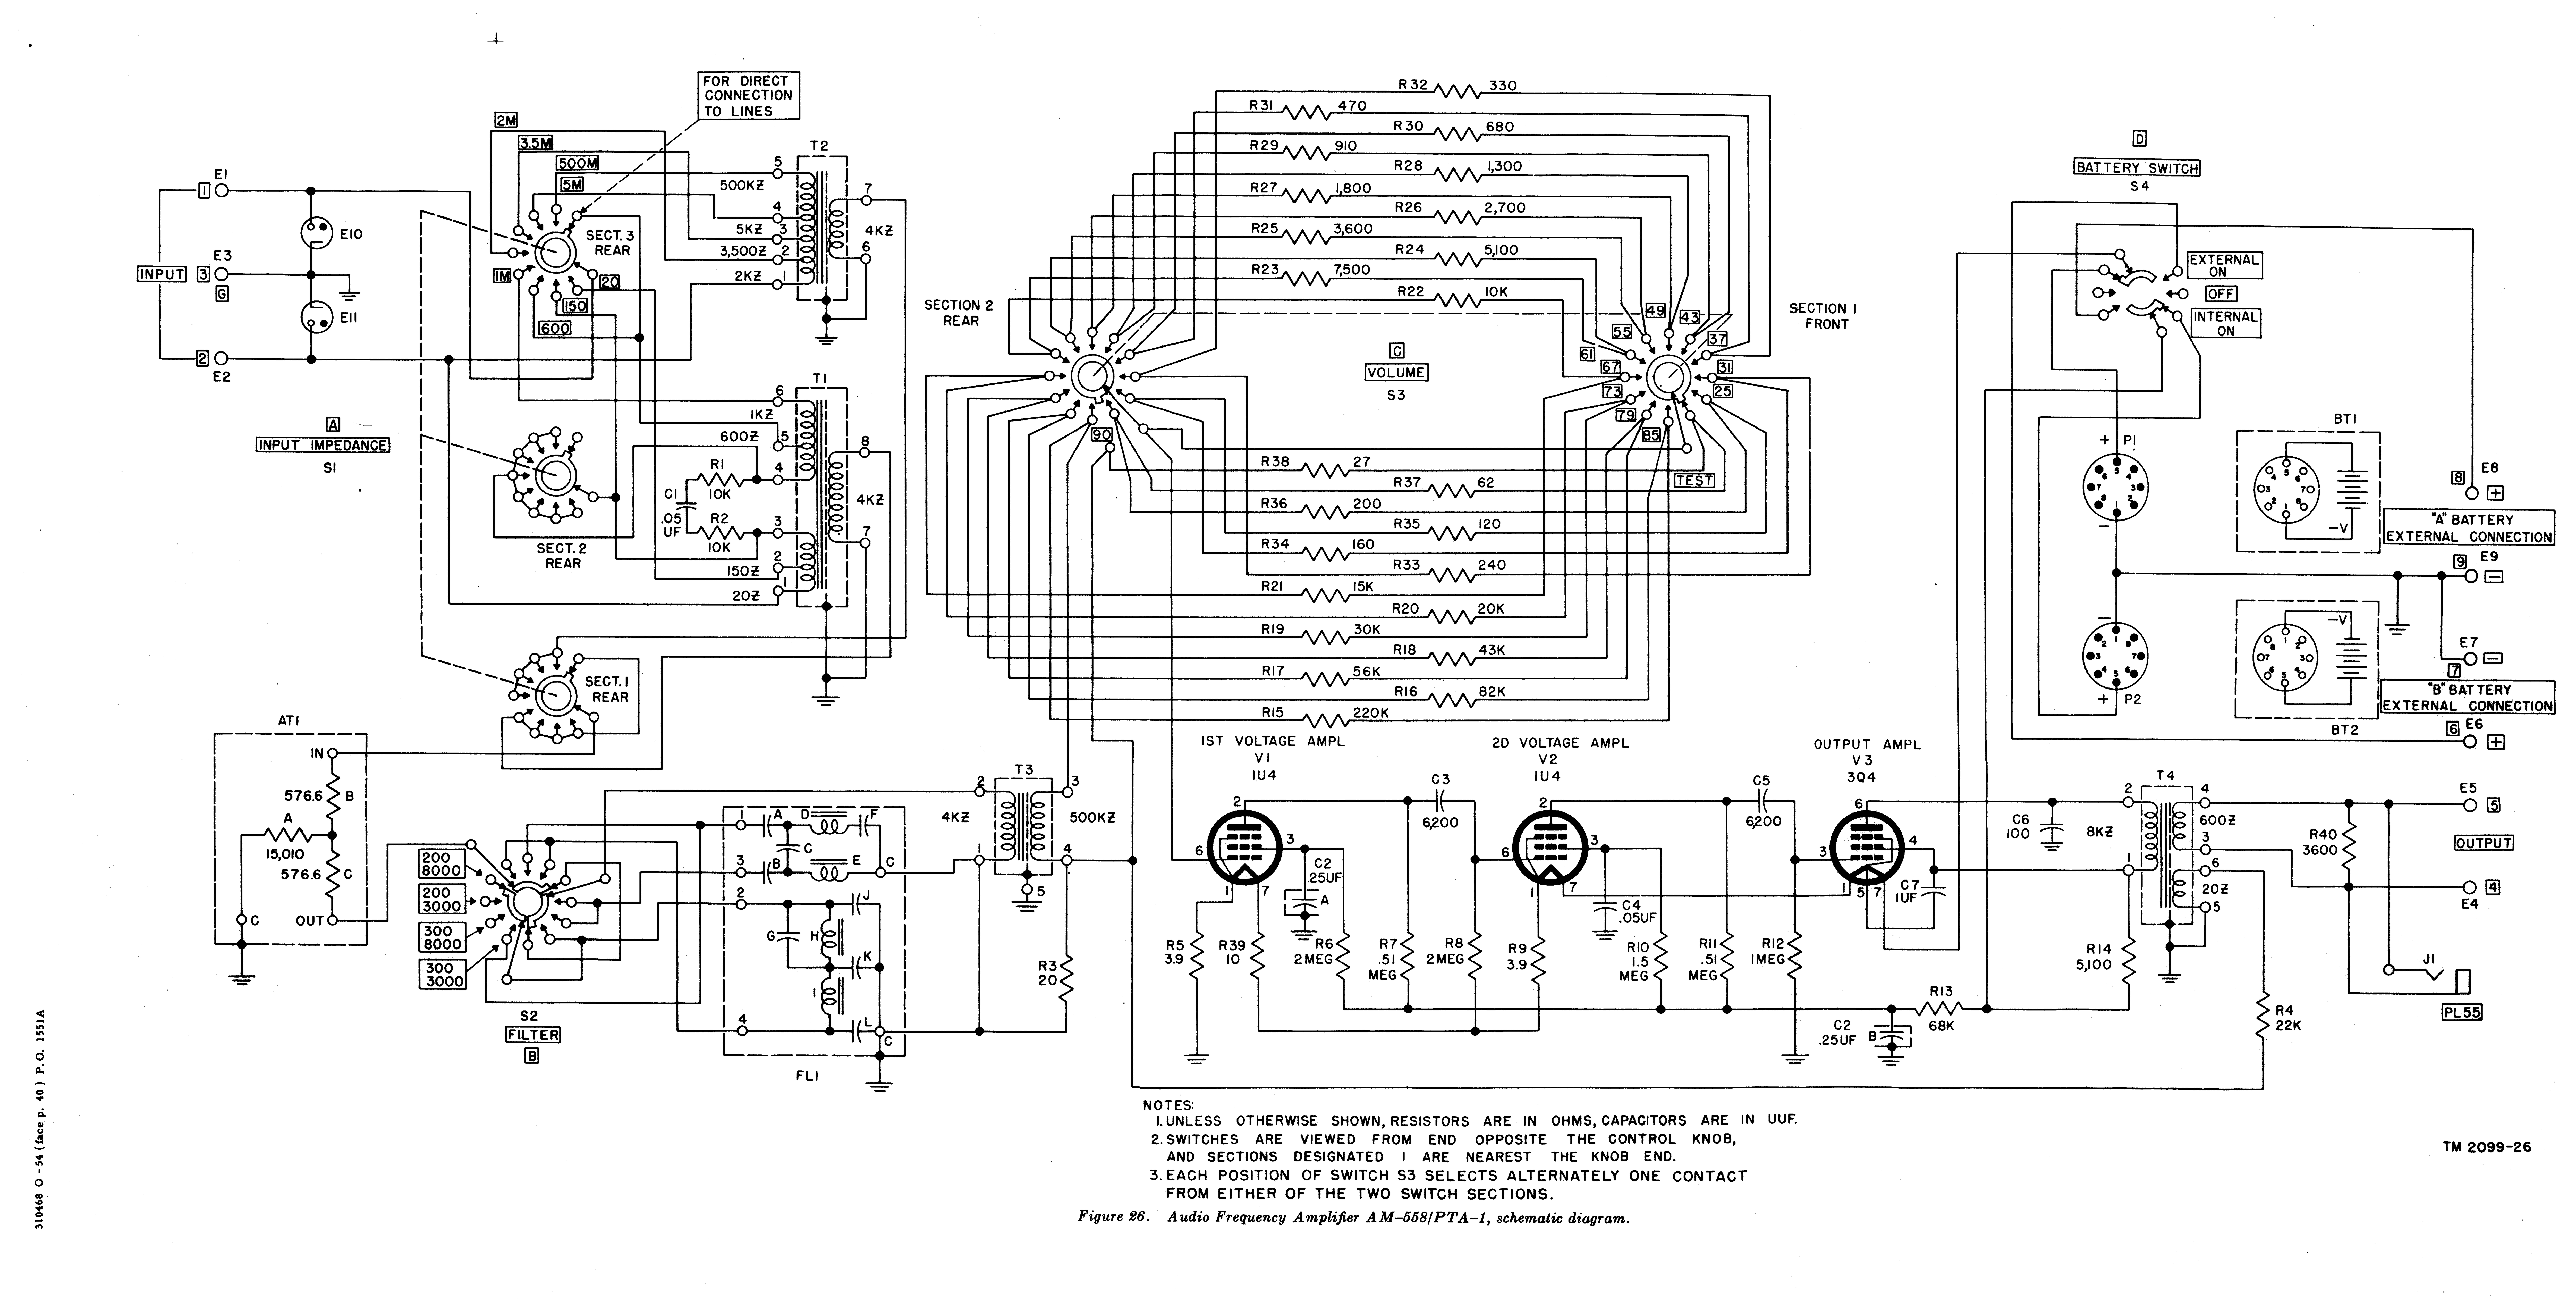 Audio Frequency Amplifier AM-558/PTA-1, schematic diagram.